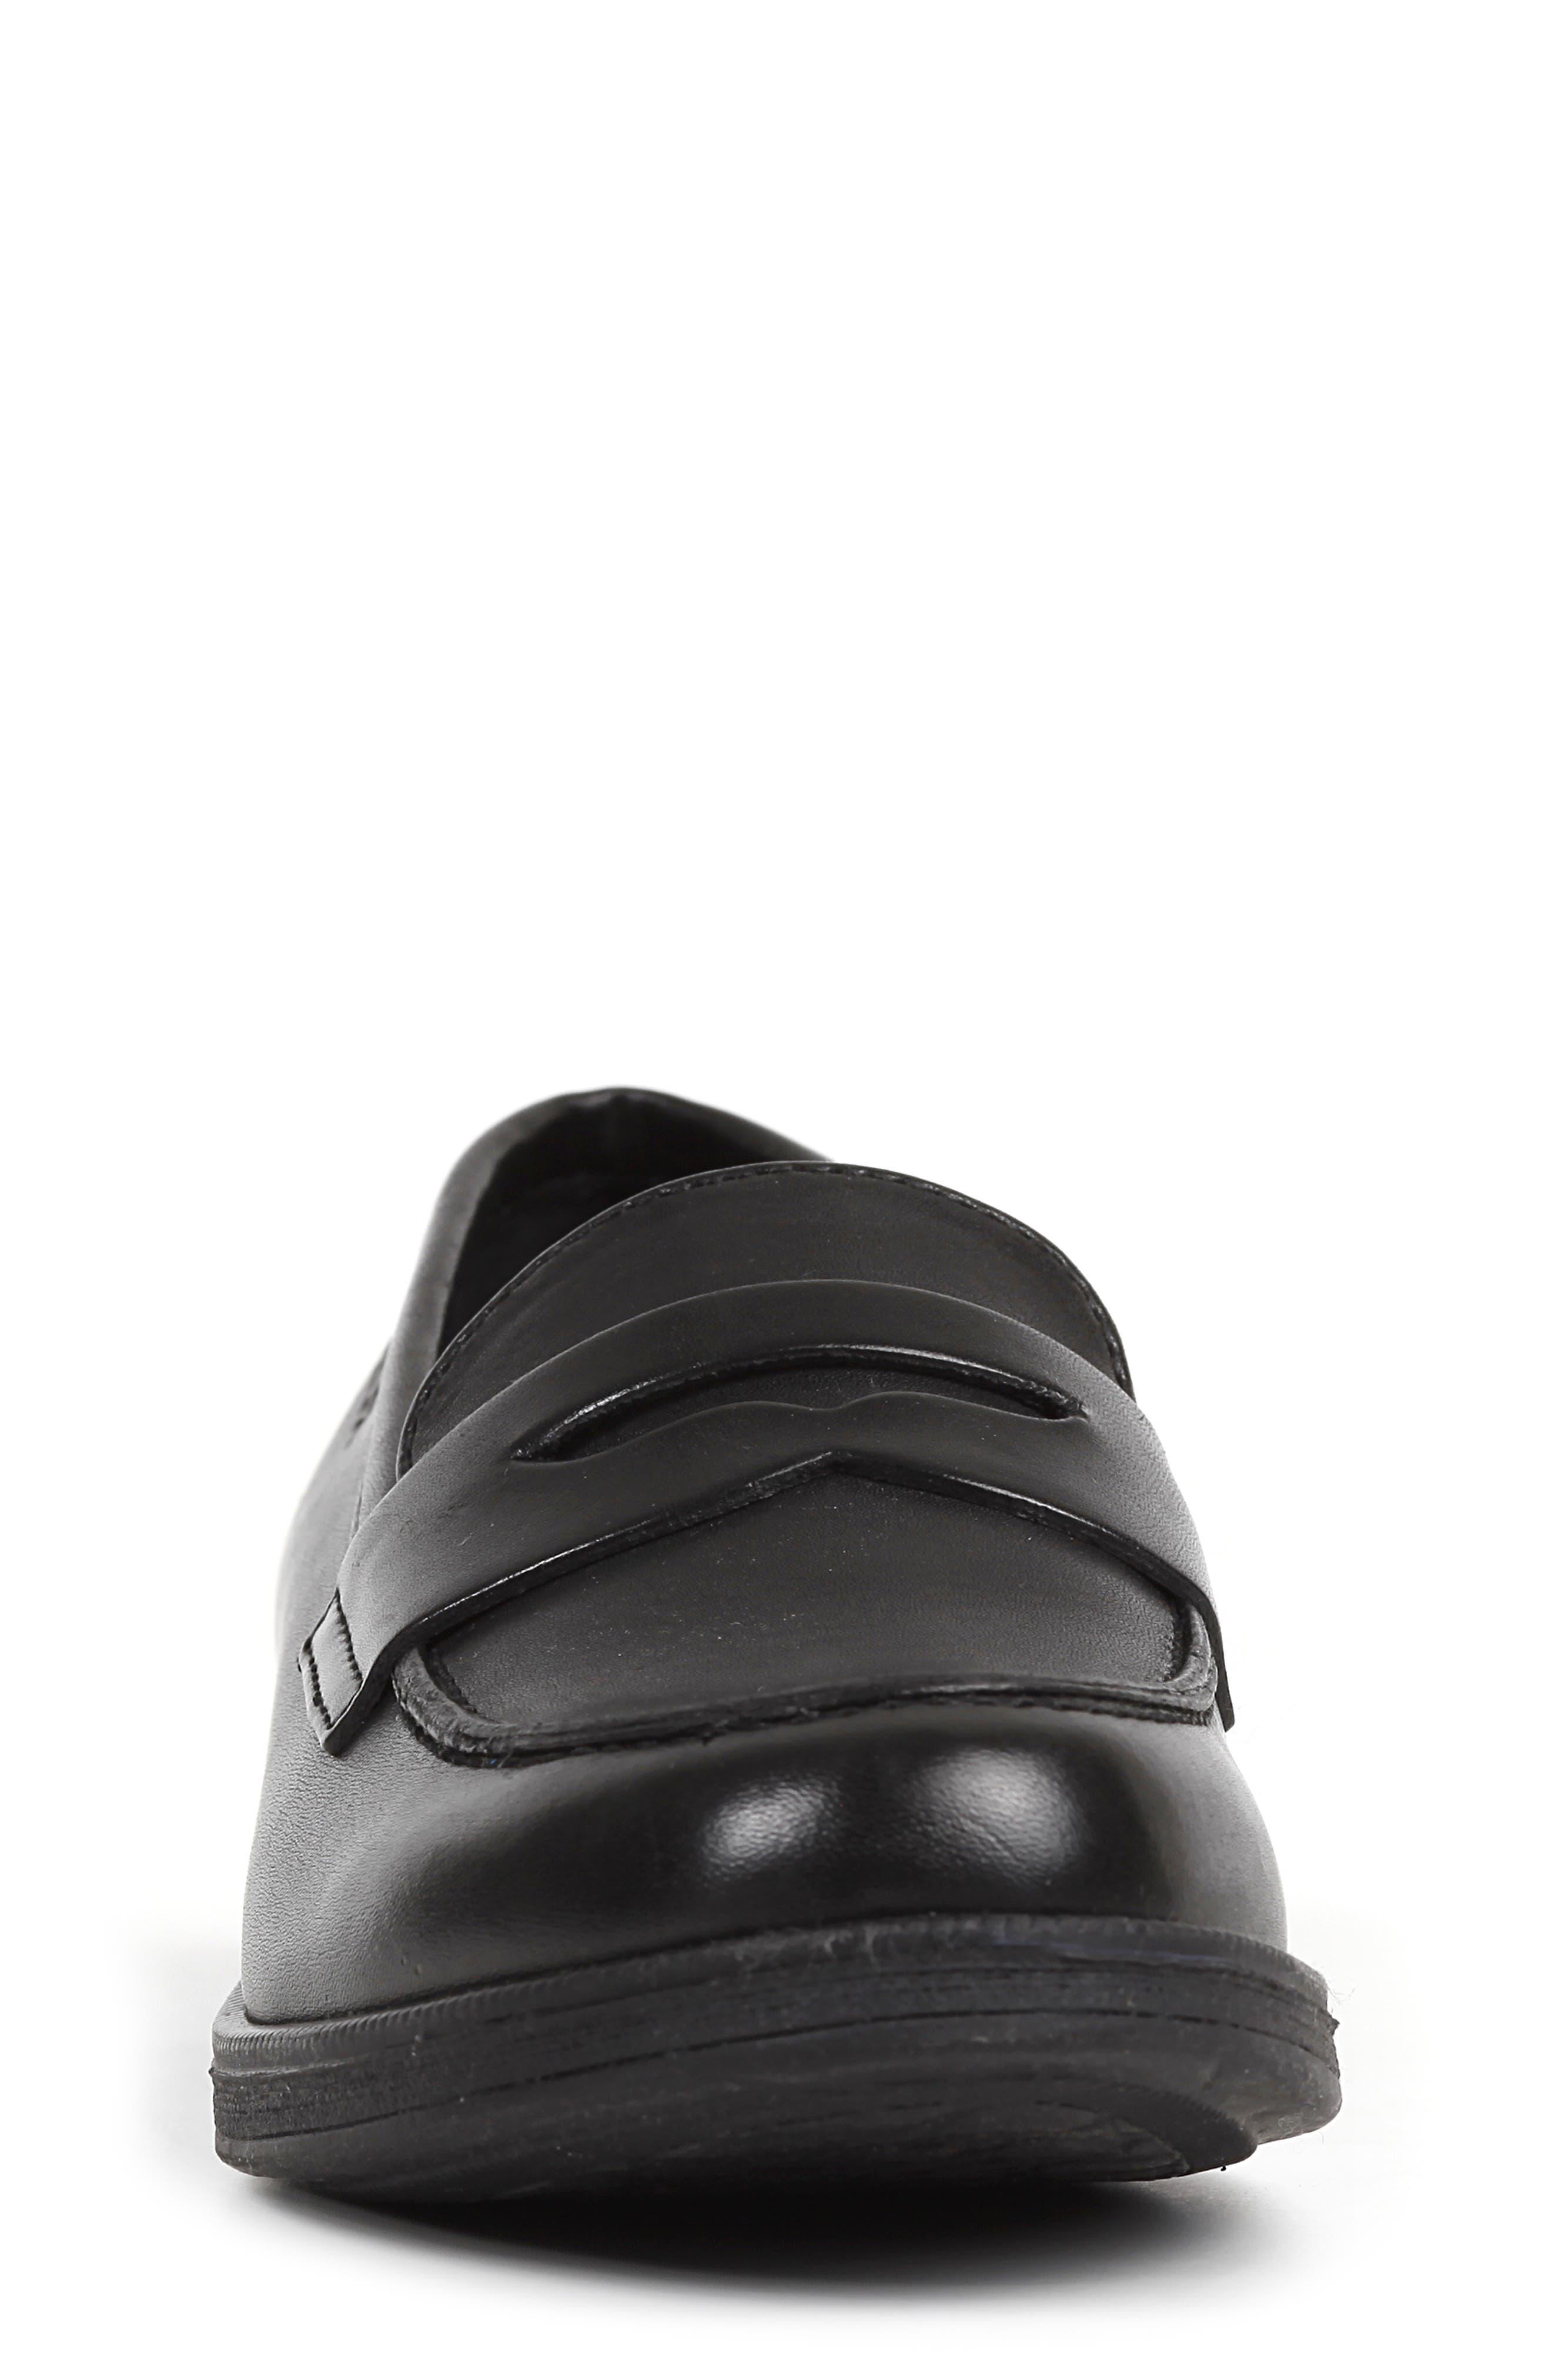 Agata 1 Penny Loafer,                             Alternate thumbnail 4, color,                             BLACK